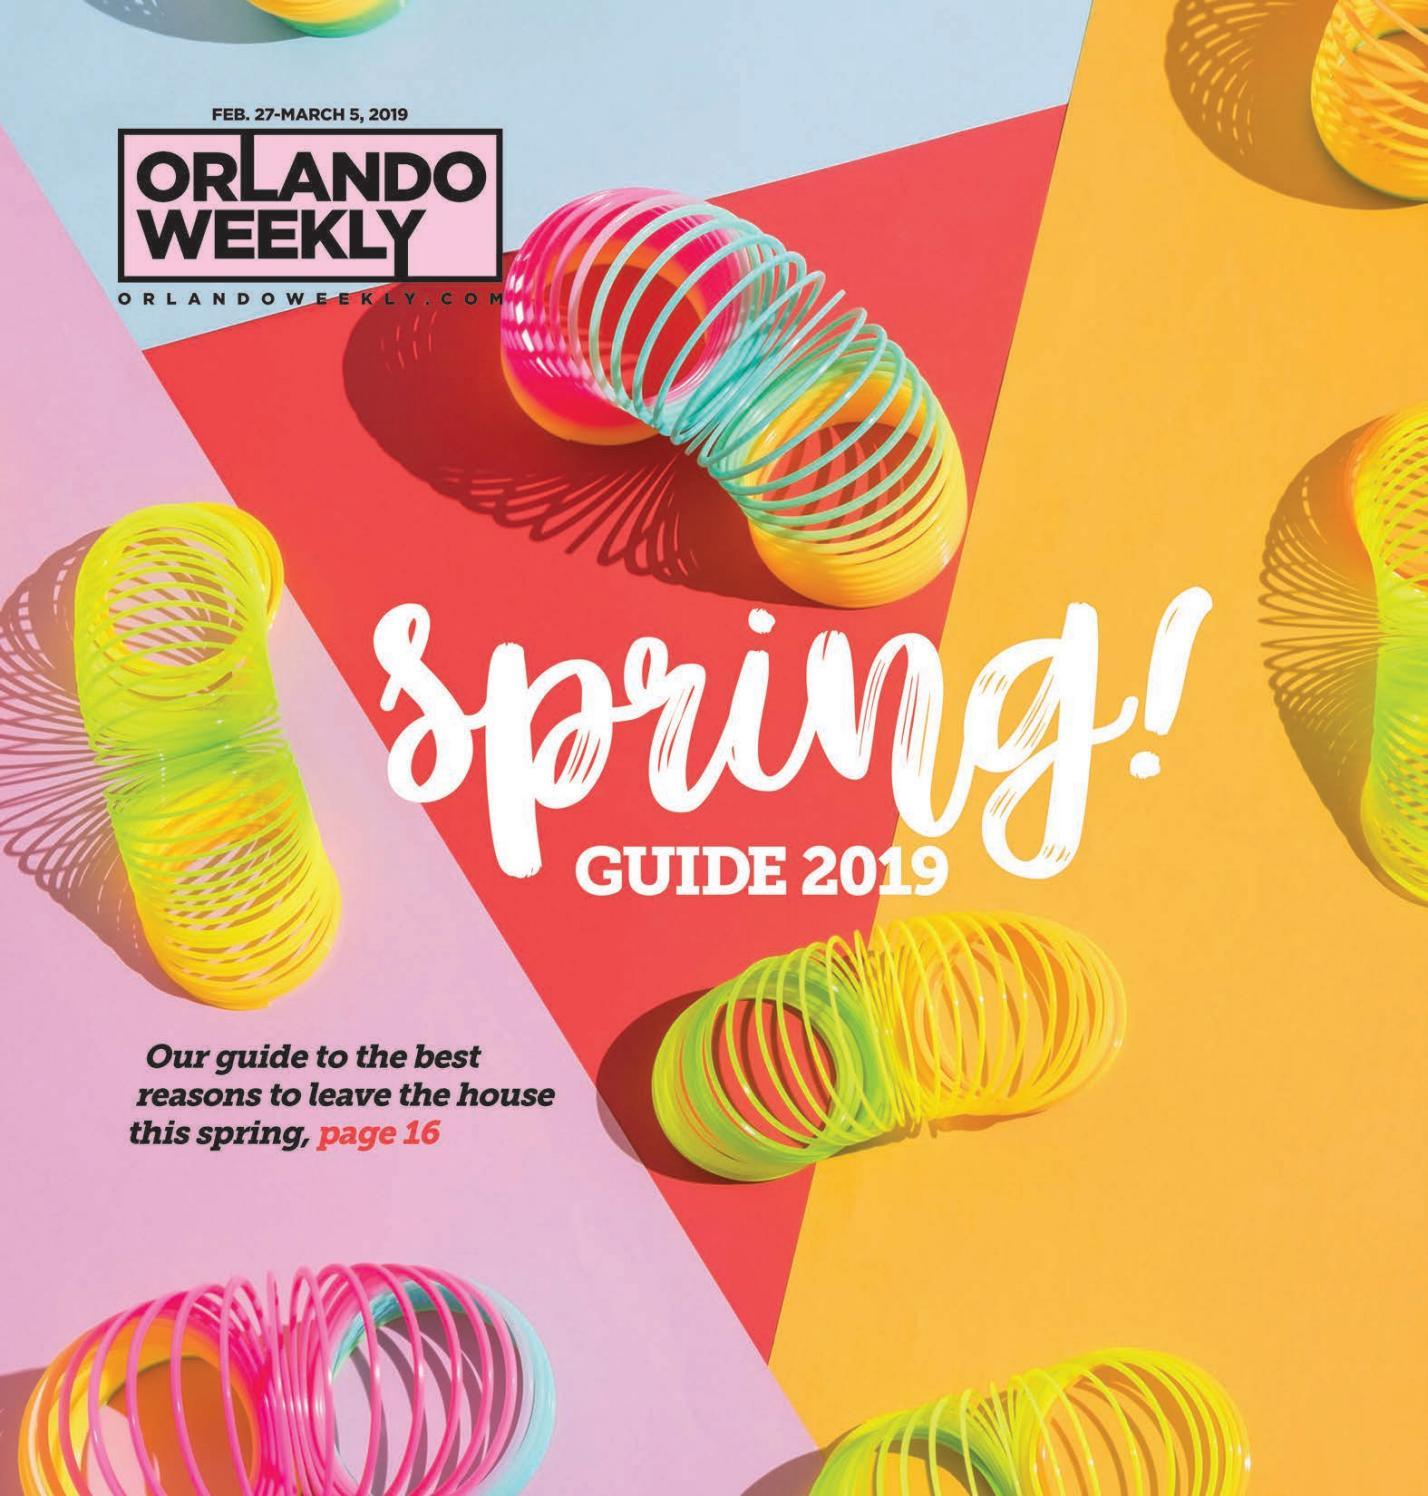 Entertainment Calendar The Pub Spanish Springs Lady Lake Fl February 2019 Orlando Weekly February 27, 2019 Spring Guide by Euclid Media